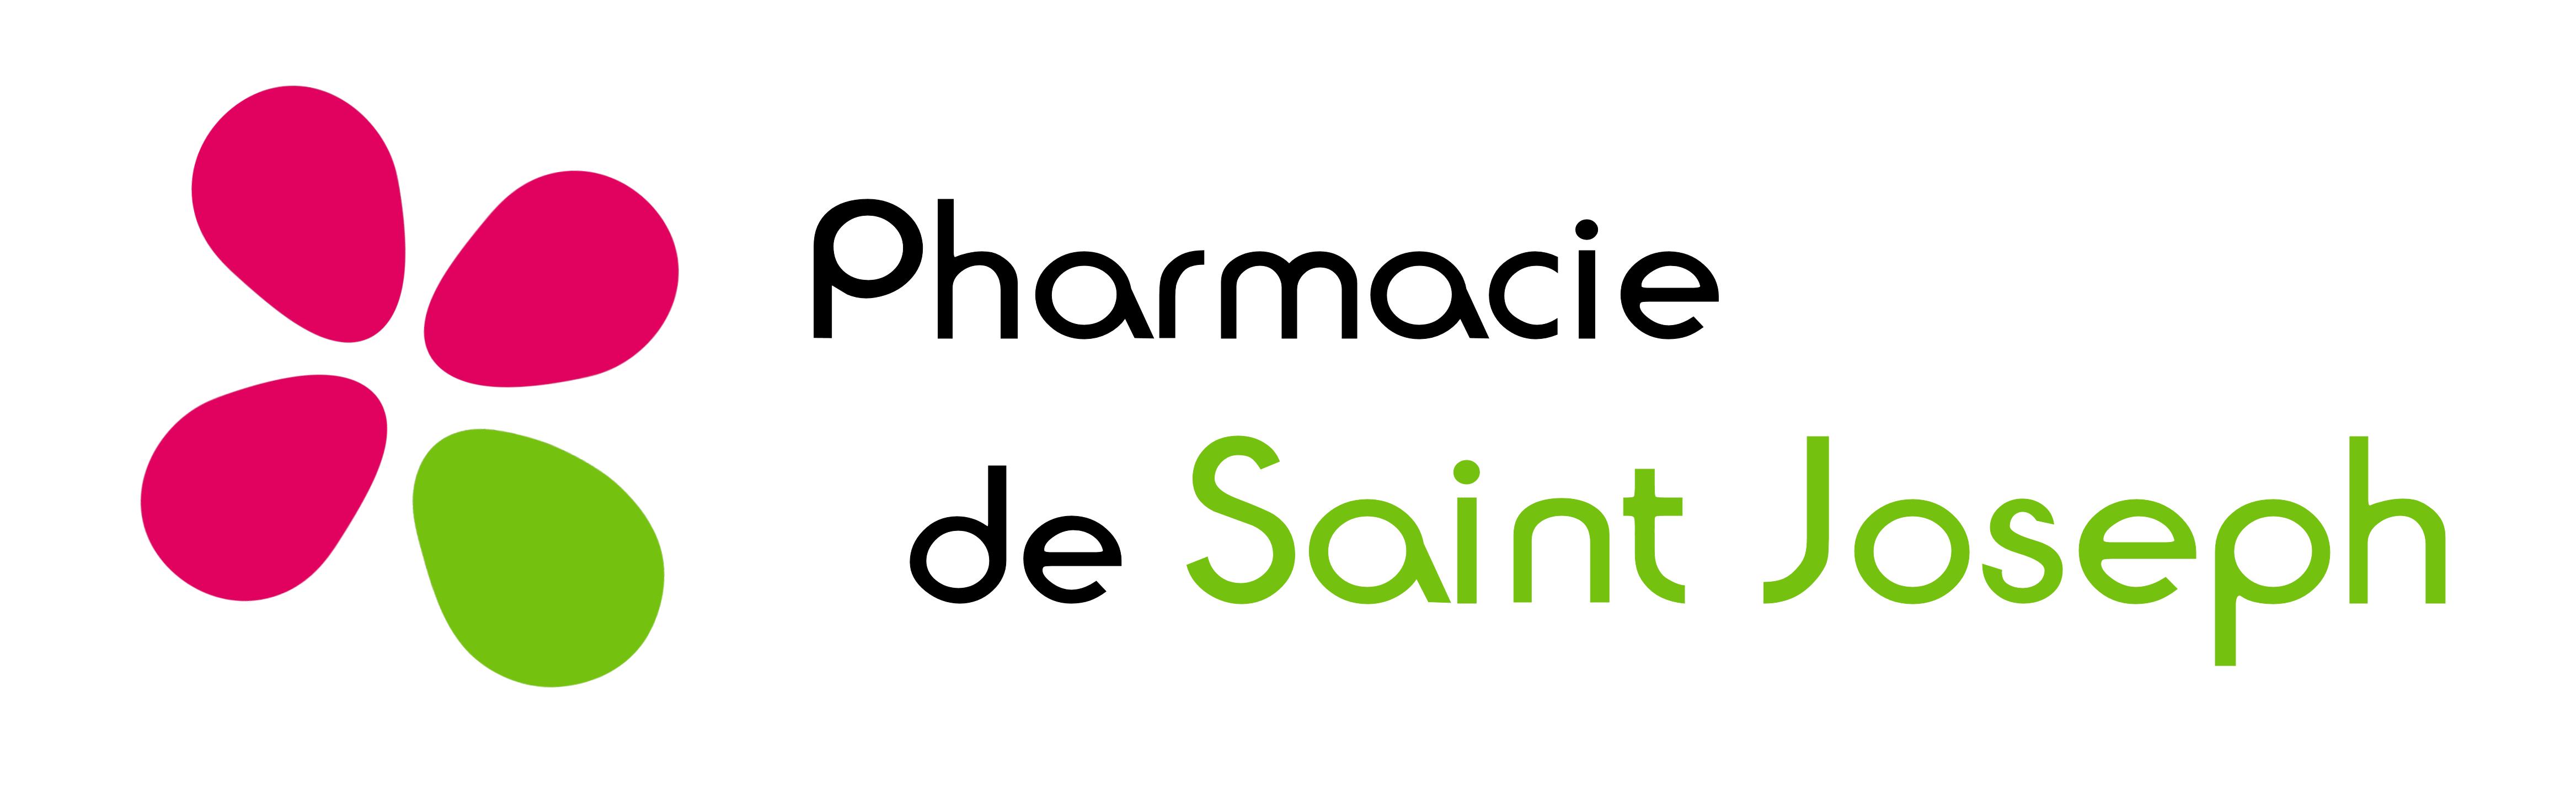 Pharmacie de Saint Joseph